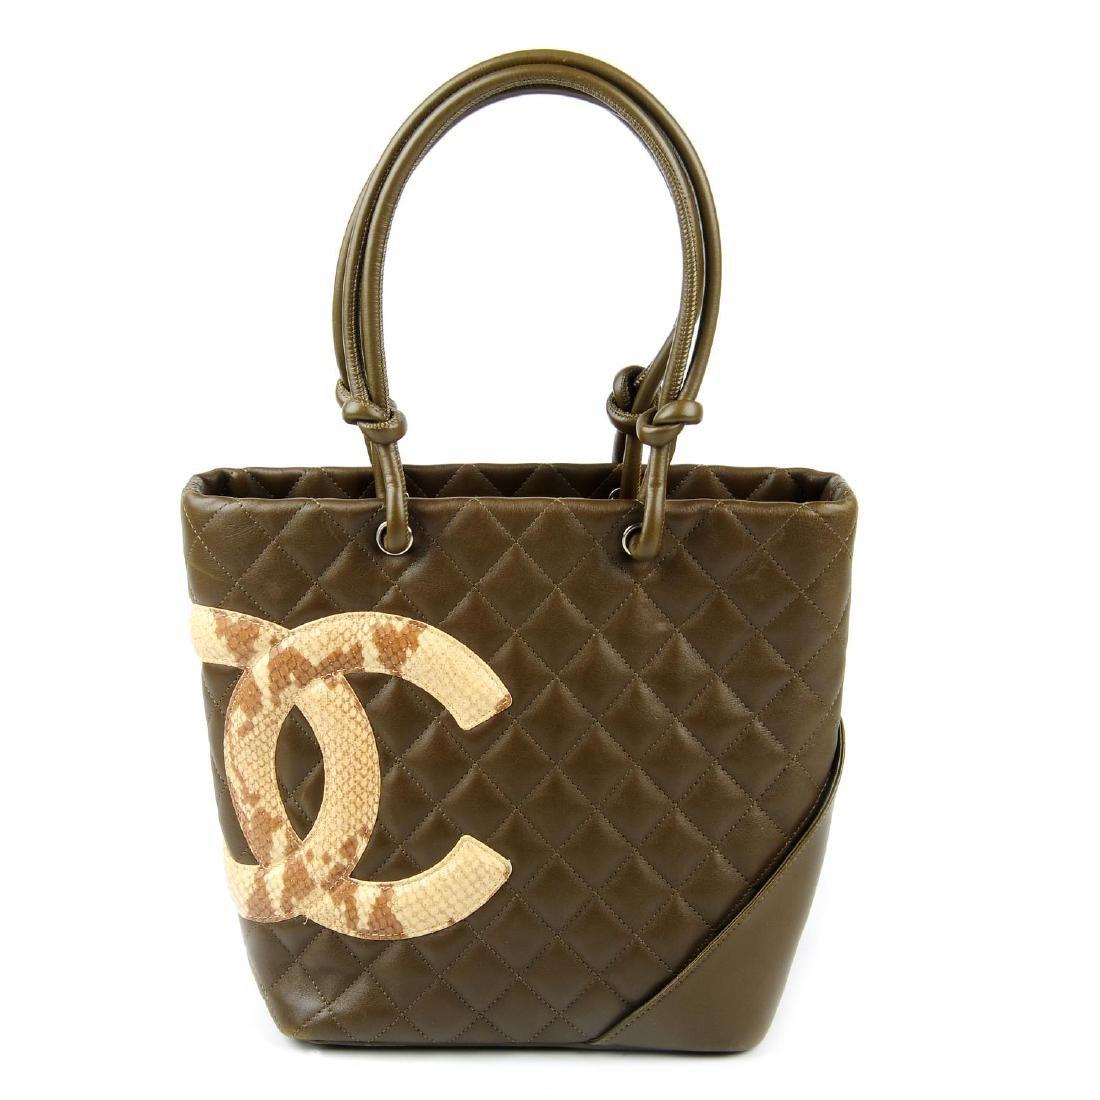 CHANEL - a Ligne Cambon handbag. Featuring a khaki